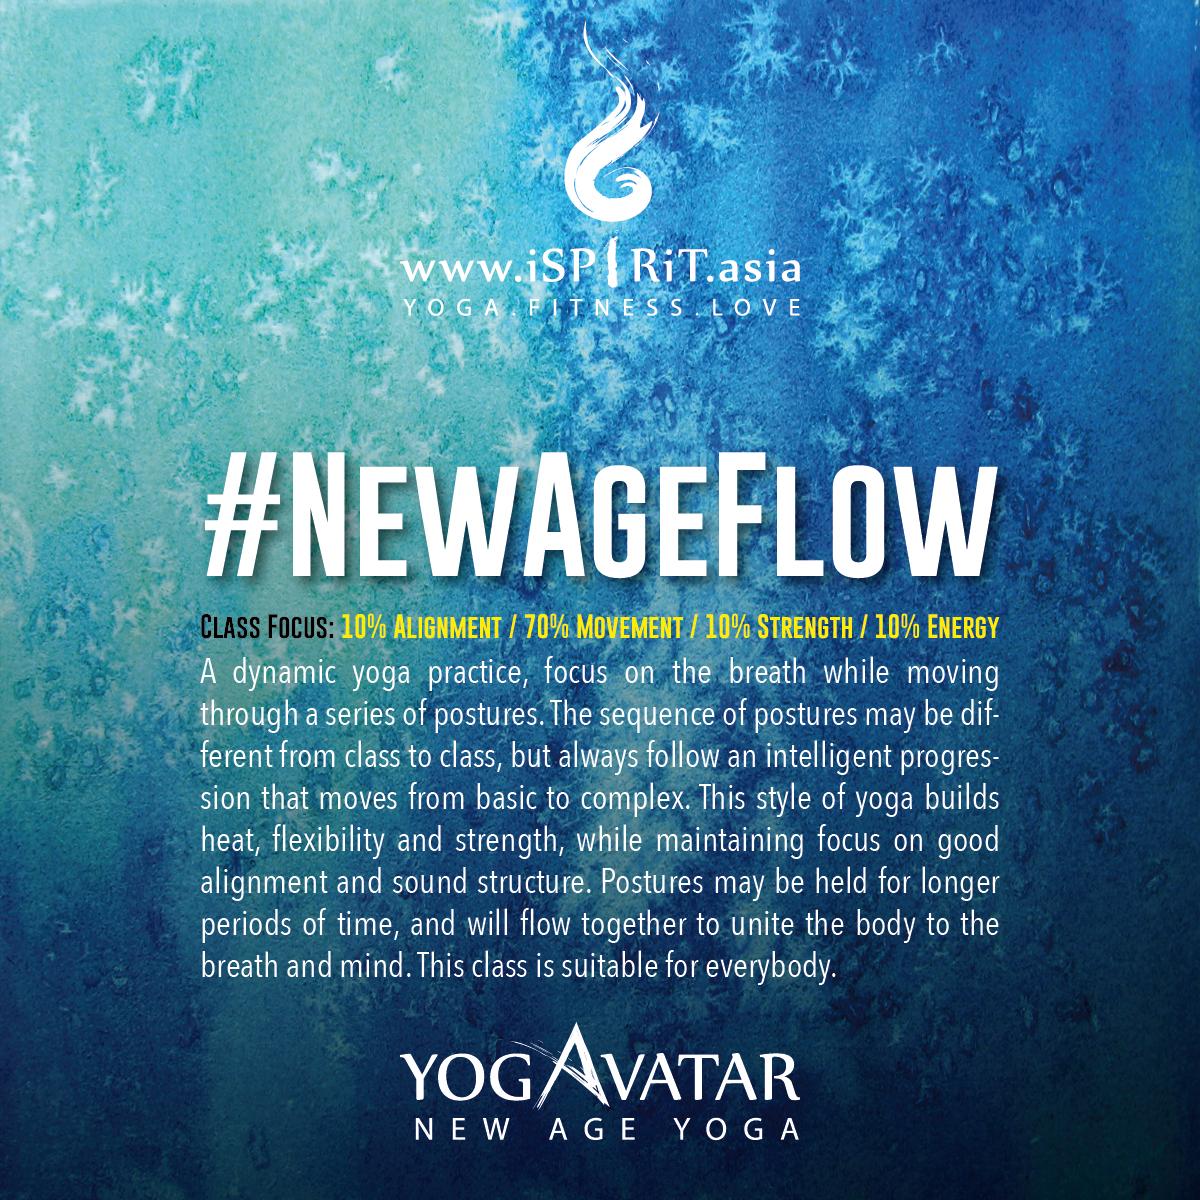 #NewAgeFlow